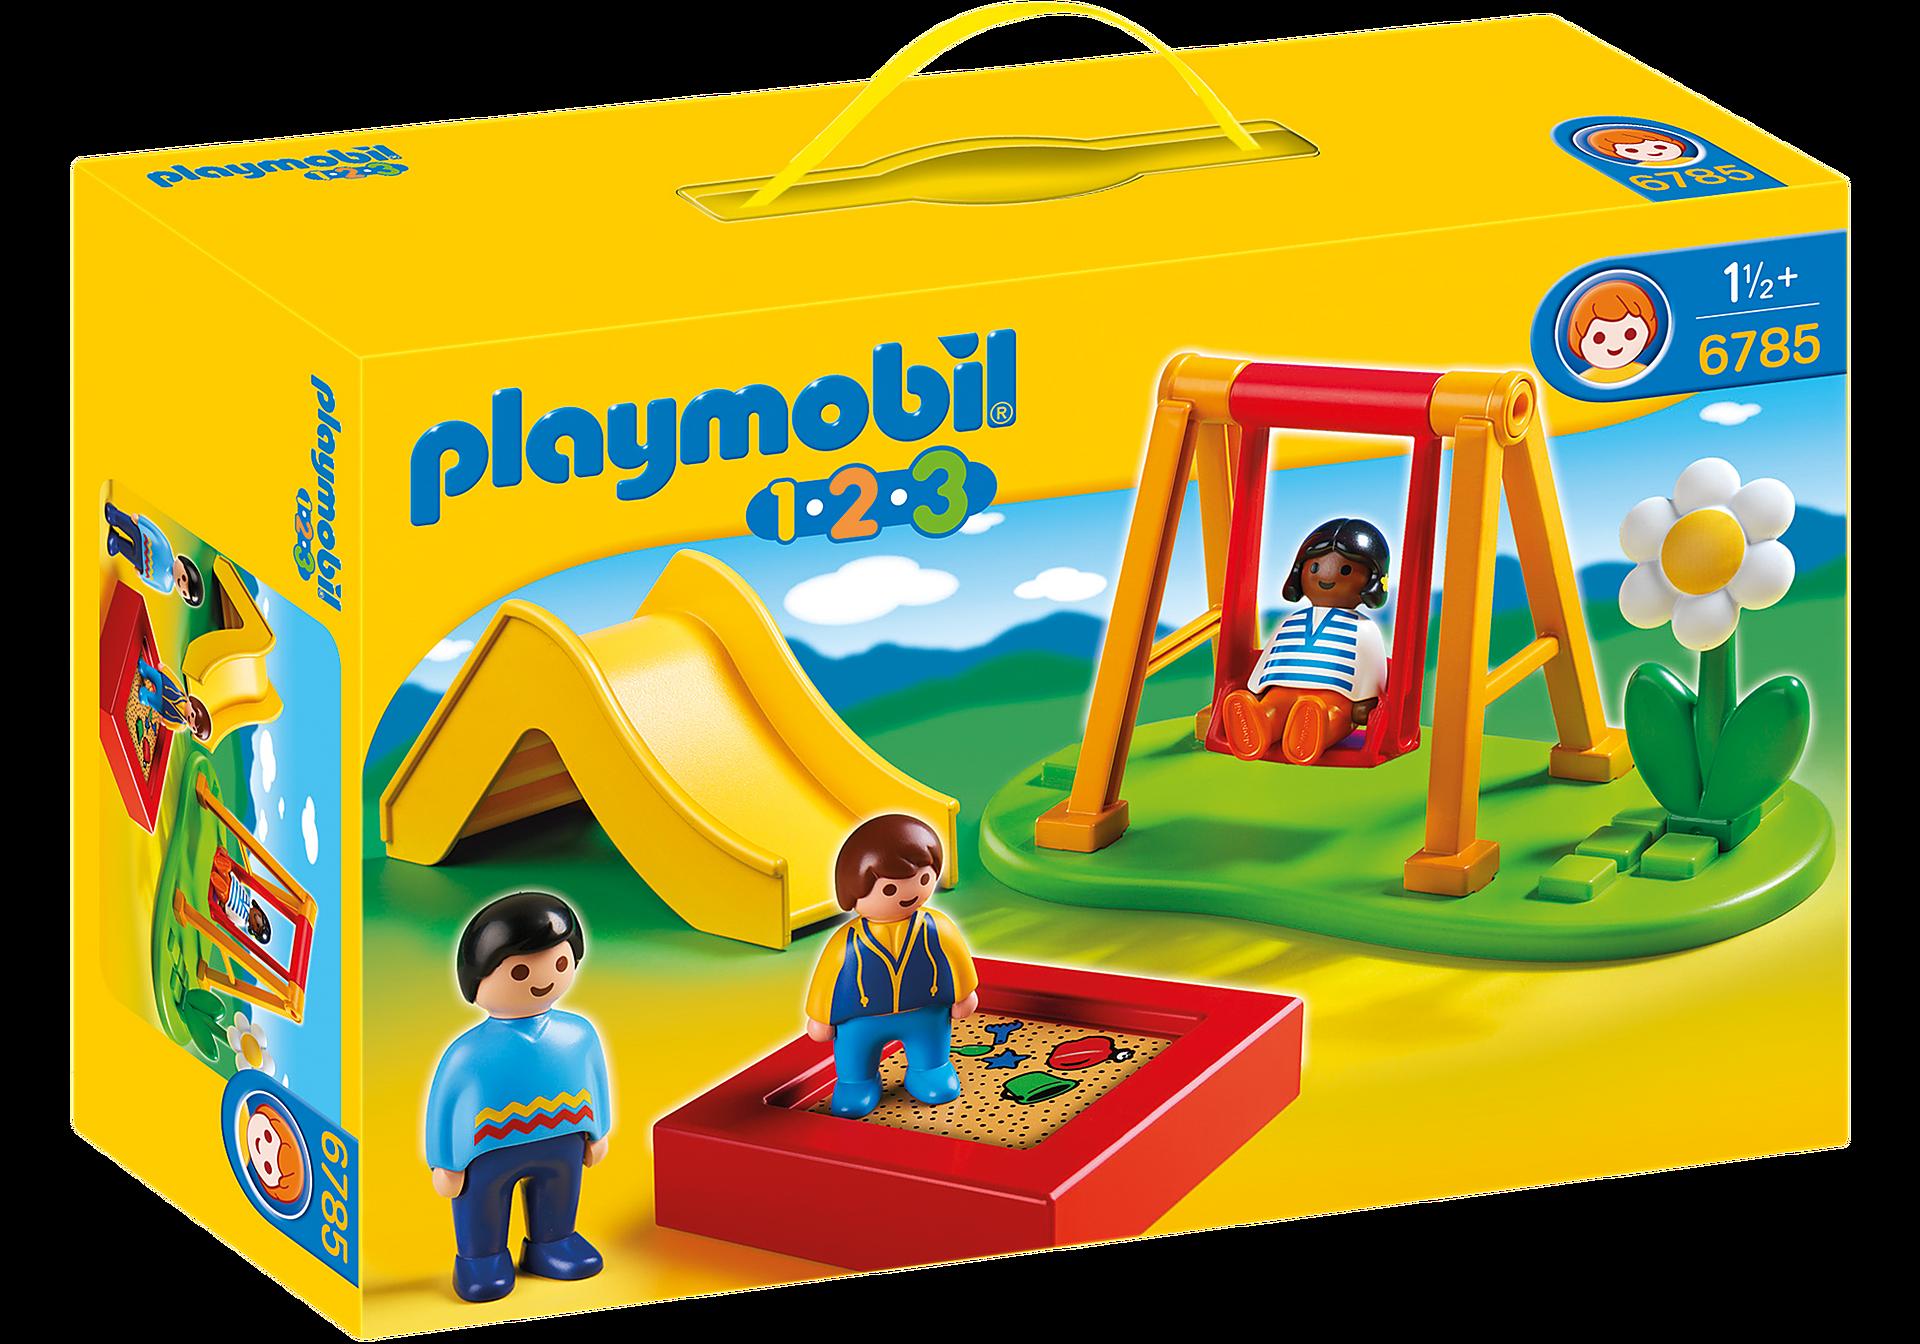 http://media.playmobil.com/i/playmobil/6785_product_box_front/Kinderspielplatz